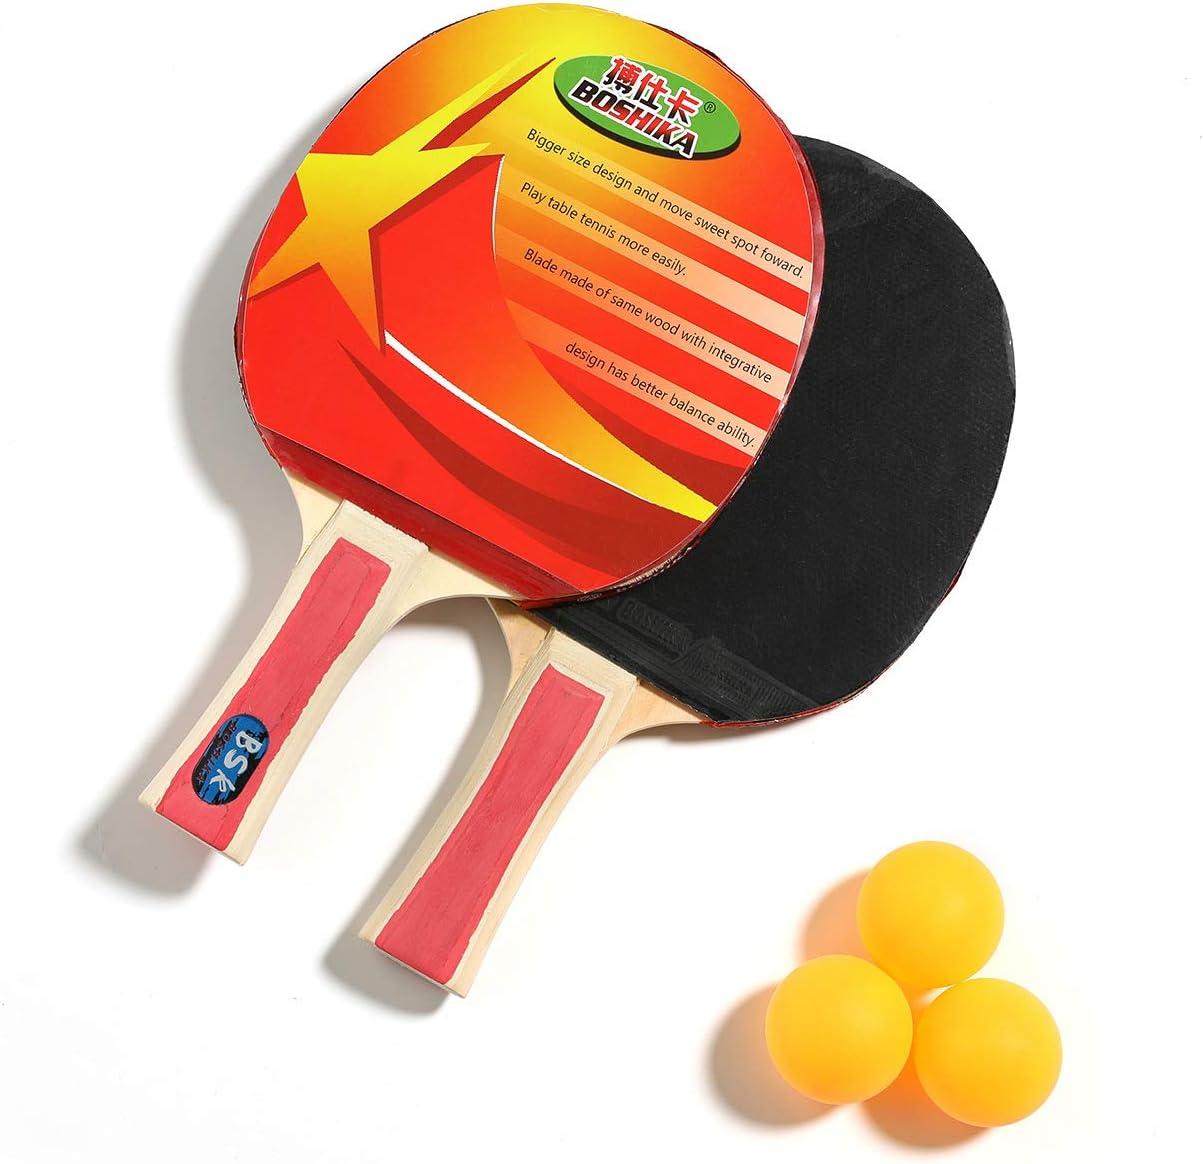 SHJMANPP Deportes Ping Pong Table Tenis De Mesa Pala Ping Pong Deportes Principiantes Juego Palo Raqueta Rotación Y Control Óptimos Deportes Velocidad Fitness, Red